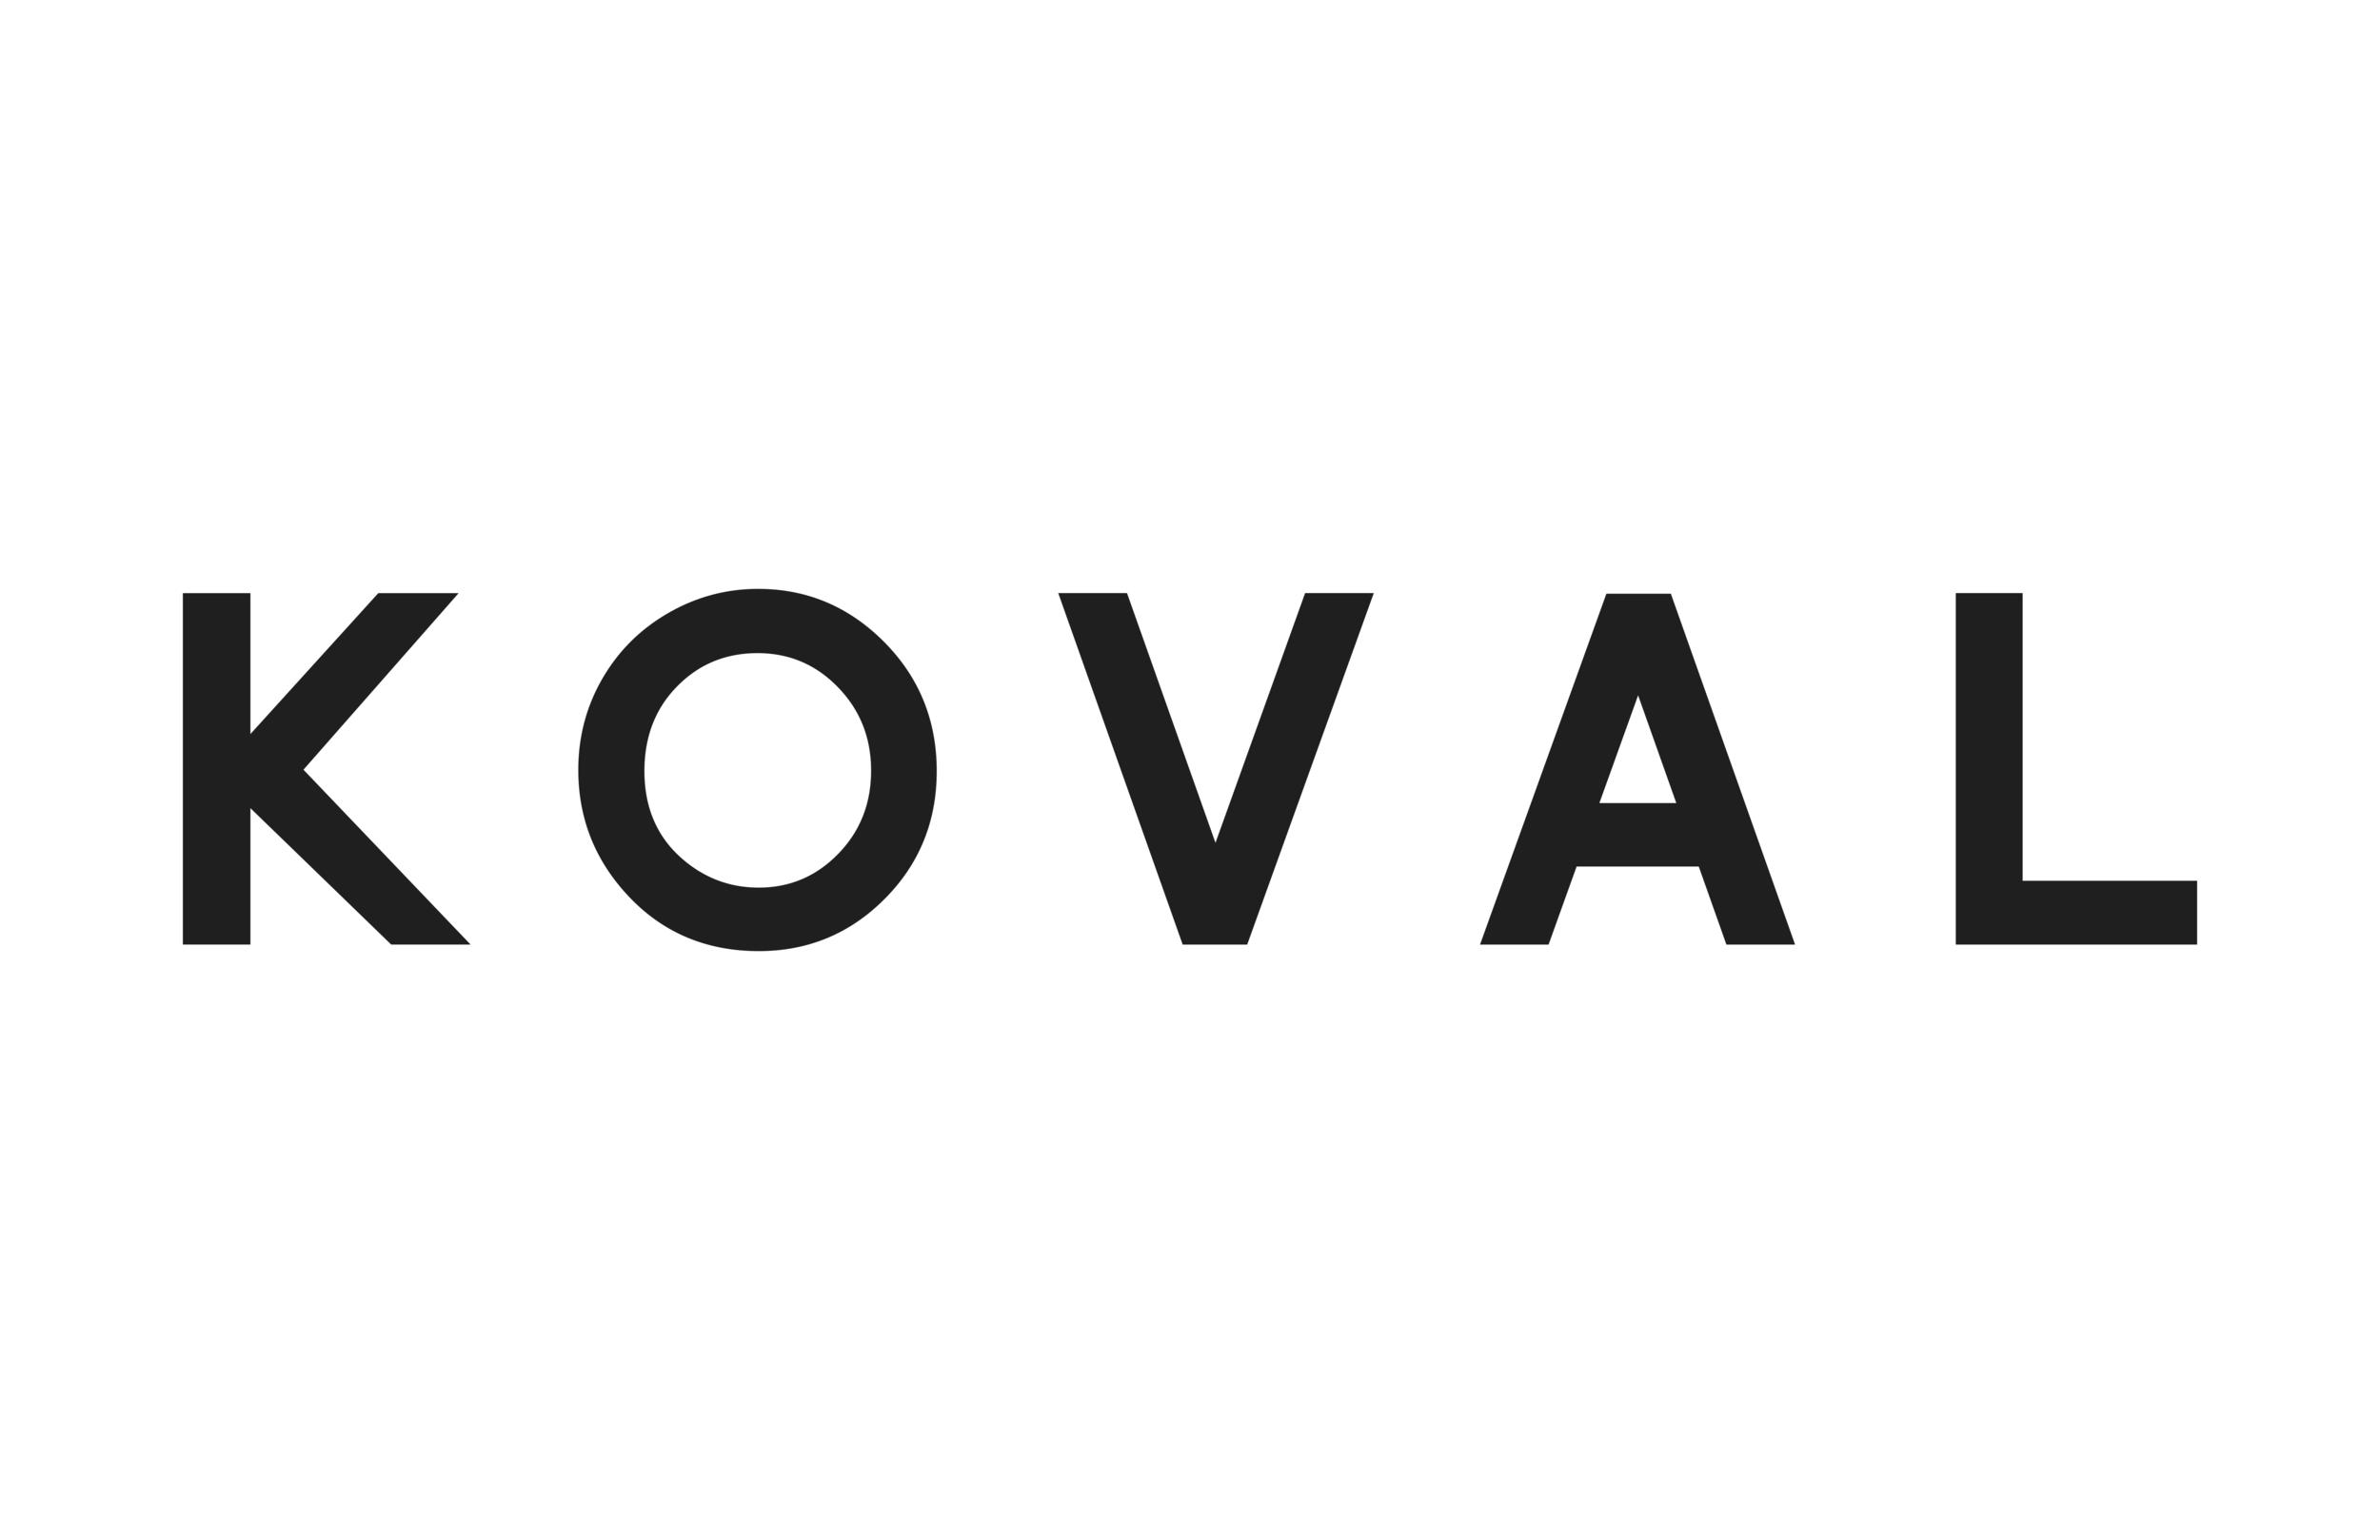 Koval_logo.png